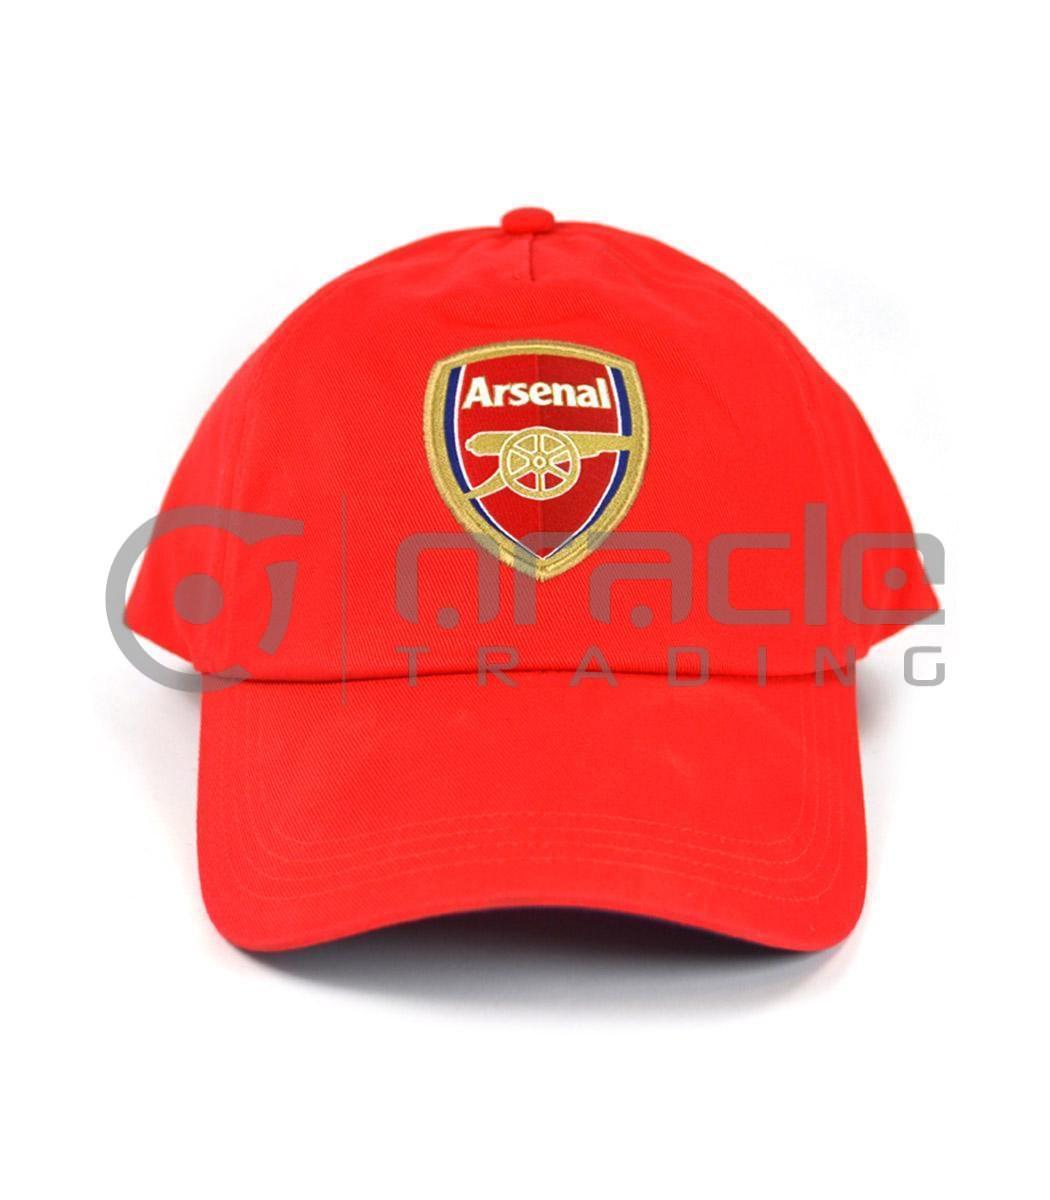 Arsenal Red Crest Hat - Puma  340cf248f67